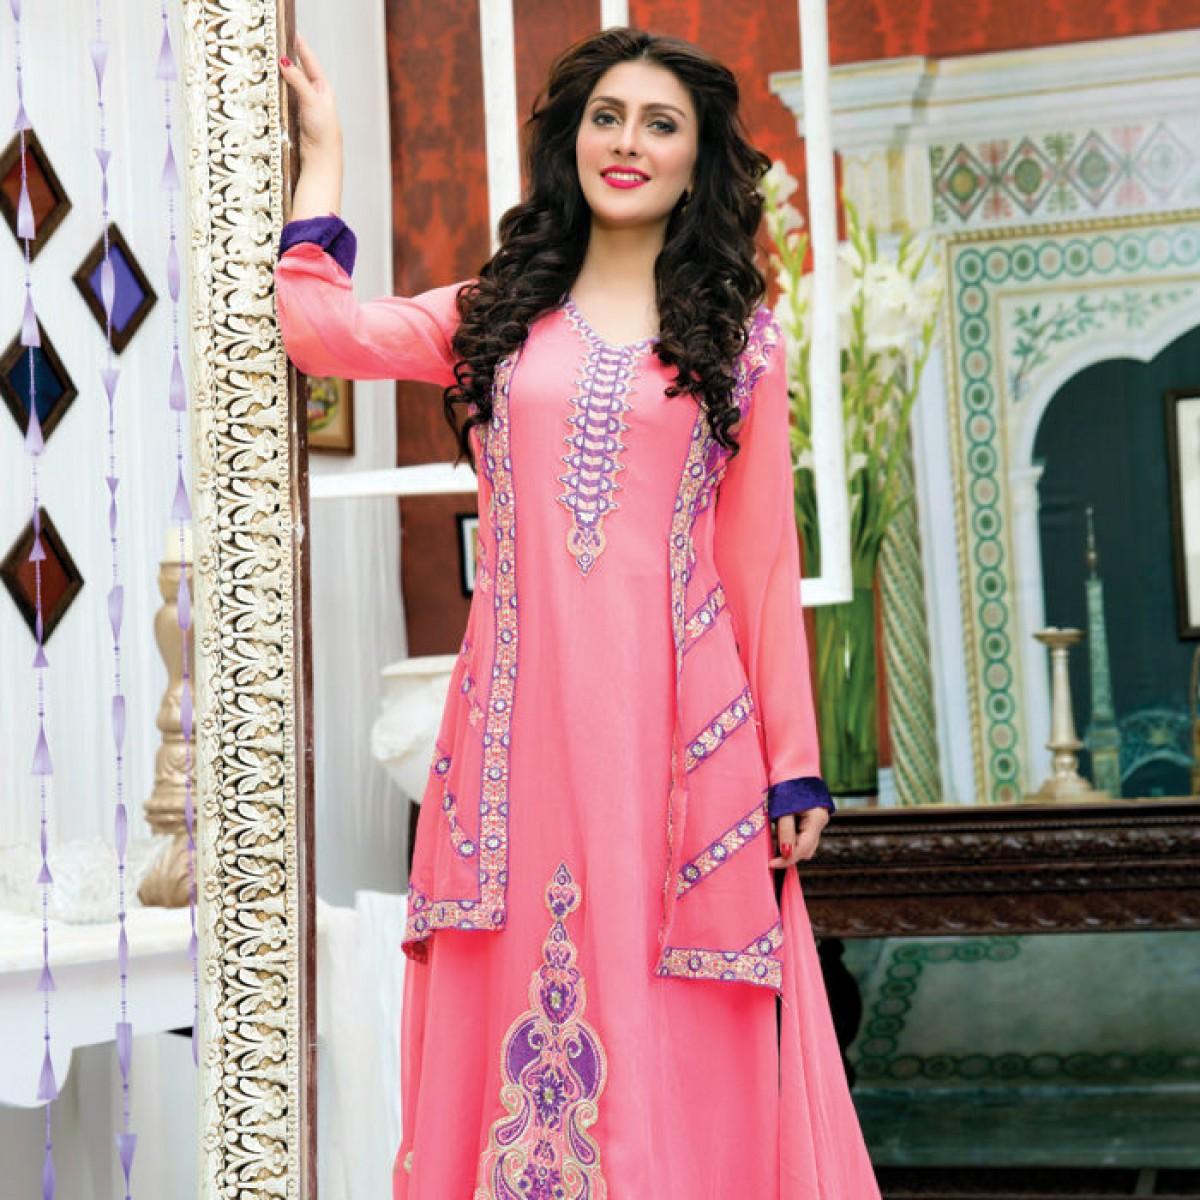 b19e544221 Beautiful Formal Dresses In Pakistan